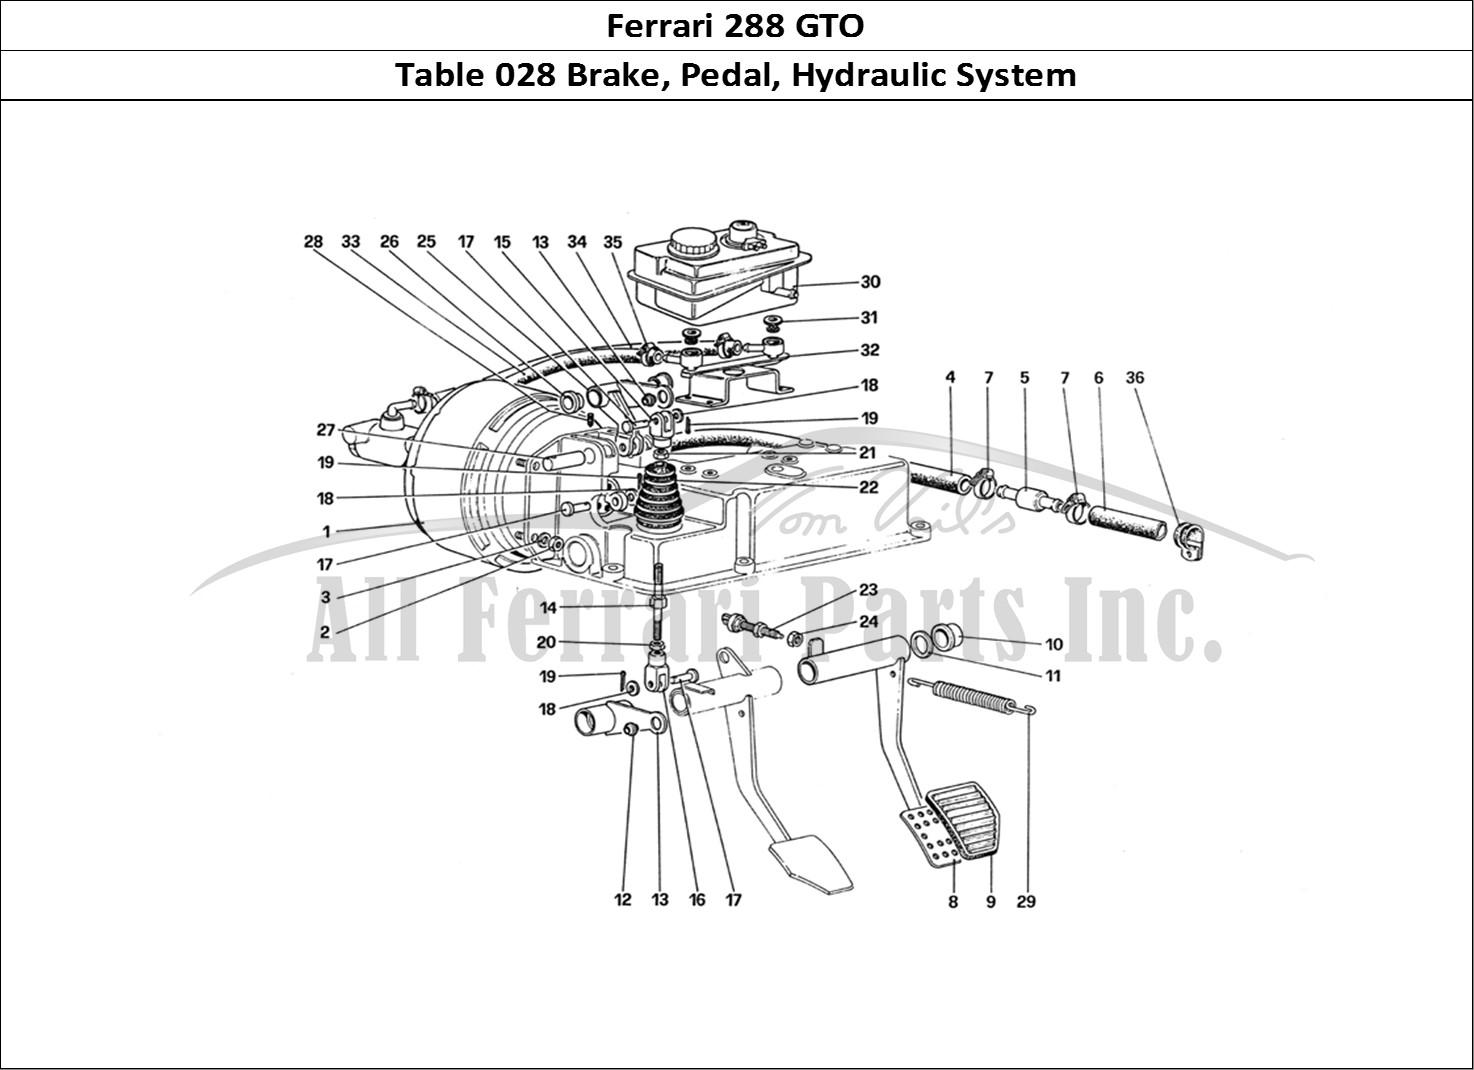 Buy Original Ferrari 288 Gto 028 Brake Pedal Hydraulic